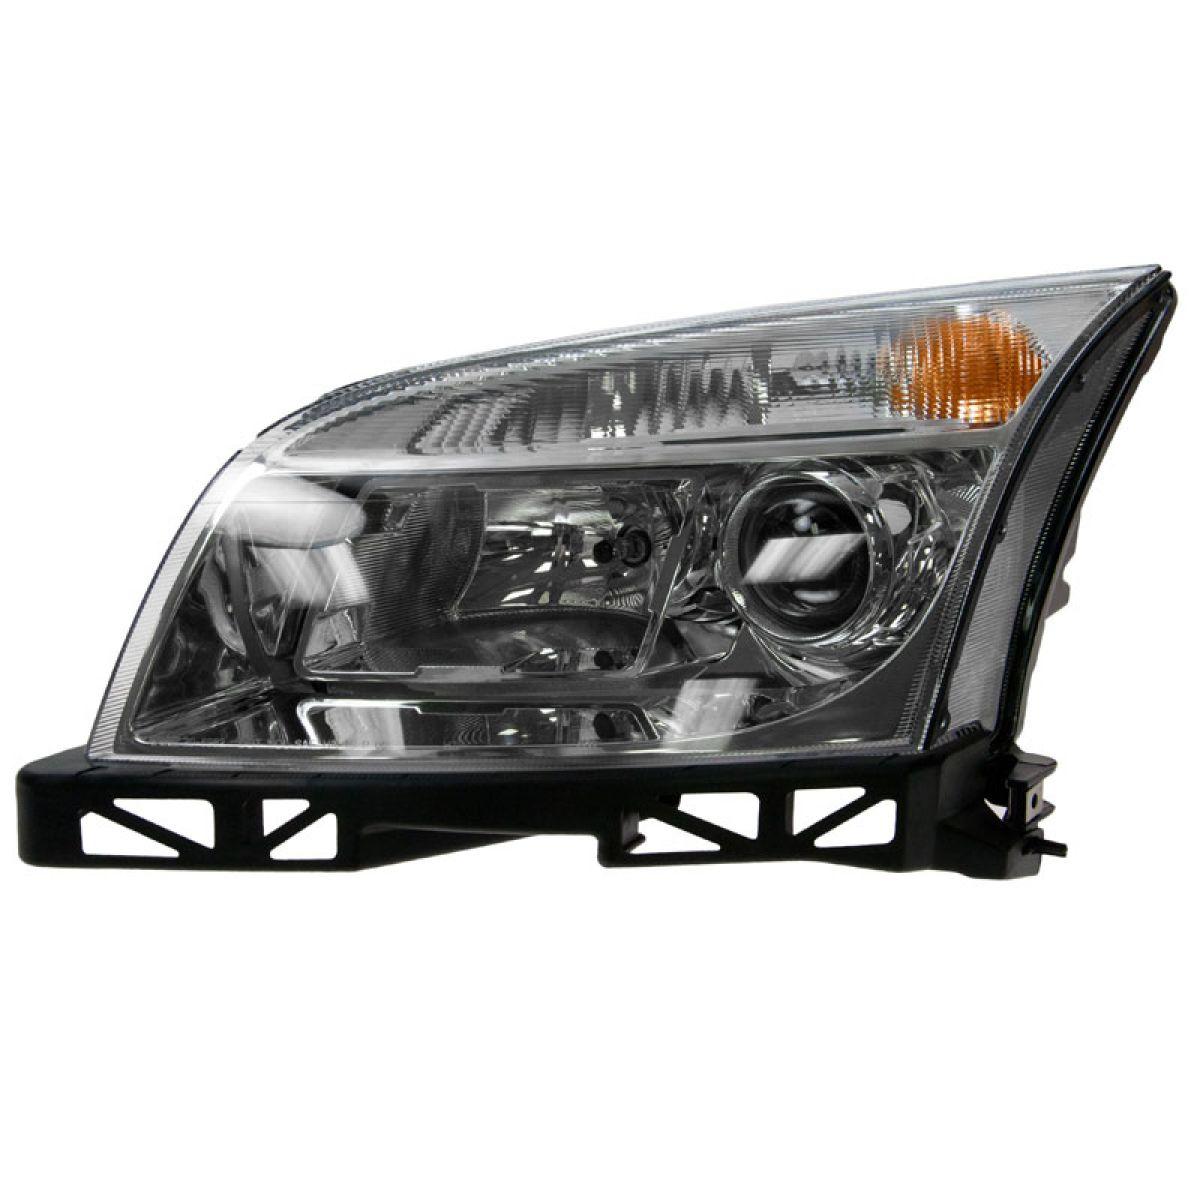 hight resolution of headlight headlamp driver side left lh new for 06 09 mercury milan